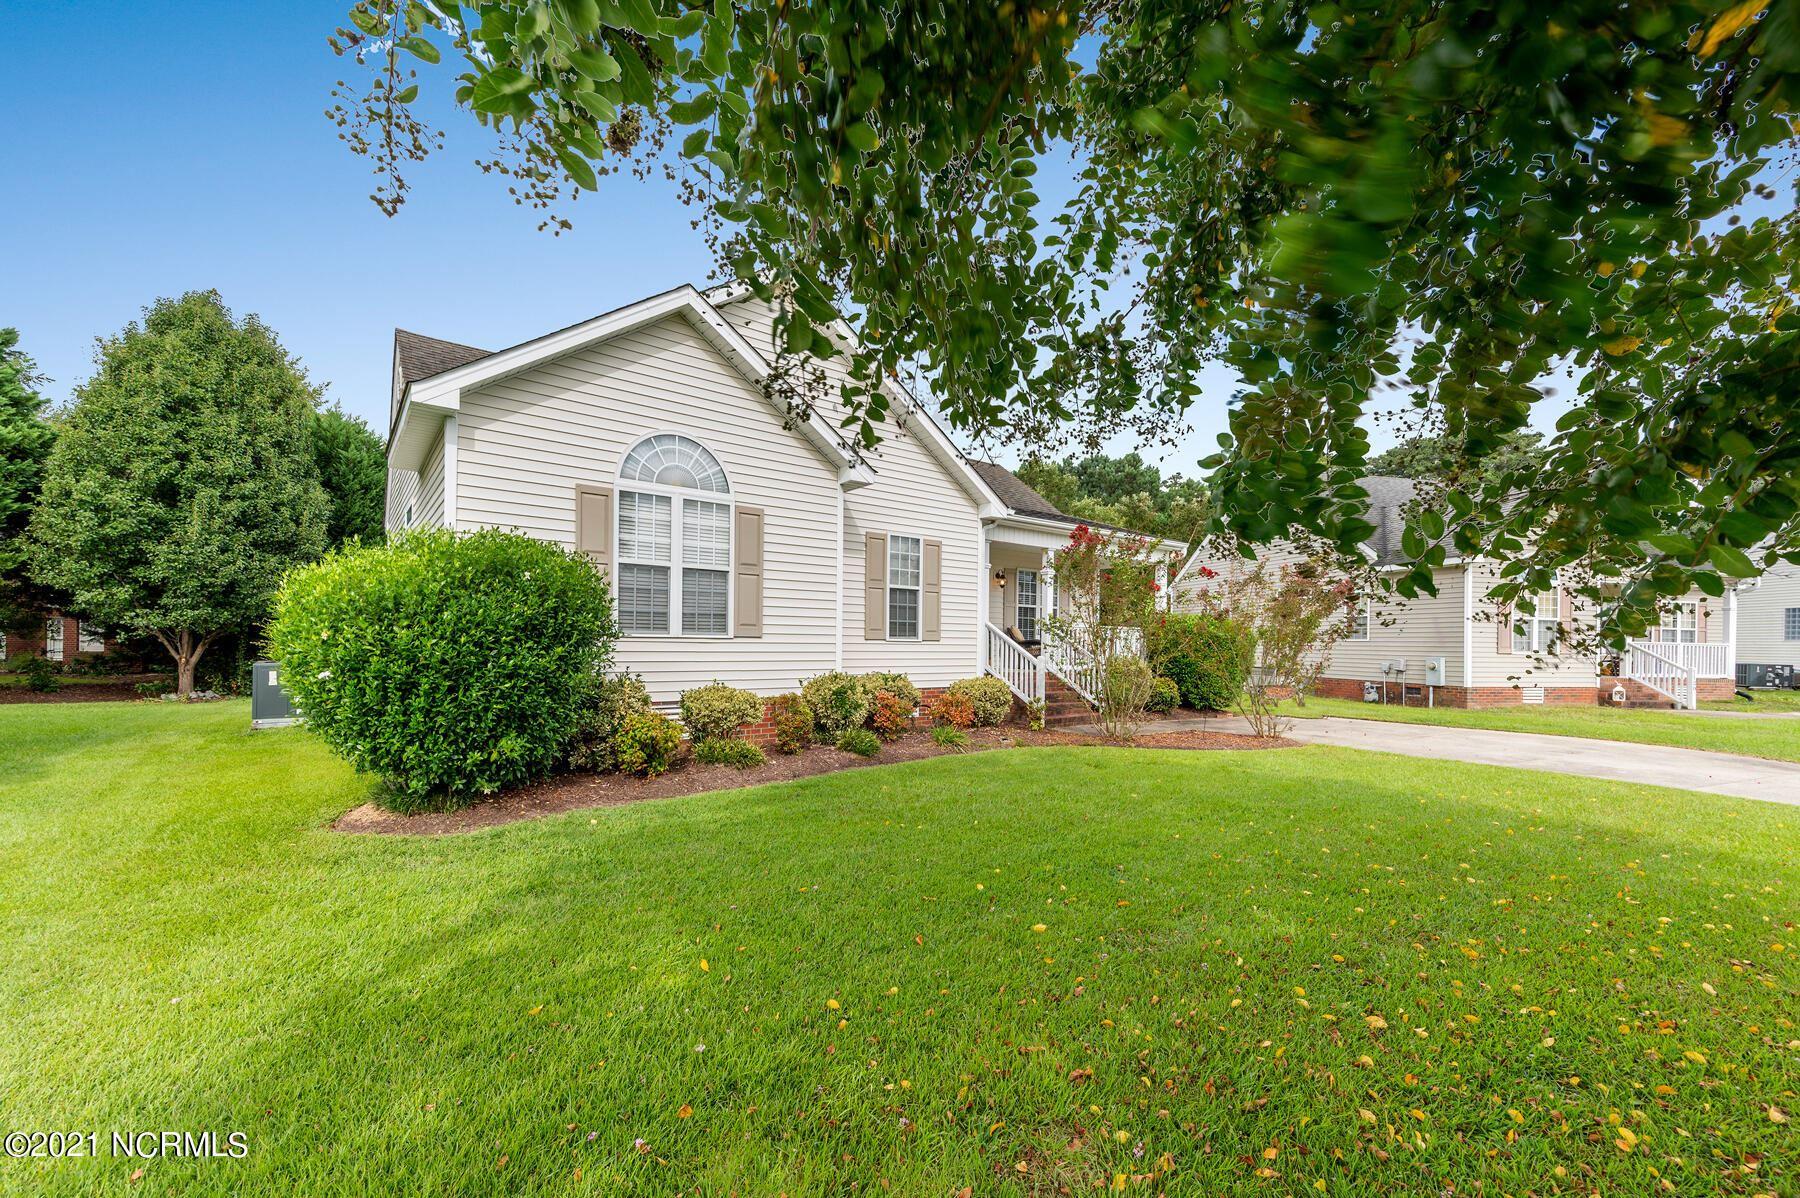 Photo of 1124 Quarterpath Drive, Winterville, NC 28590 (MLS # 100290030)